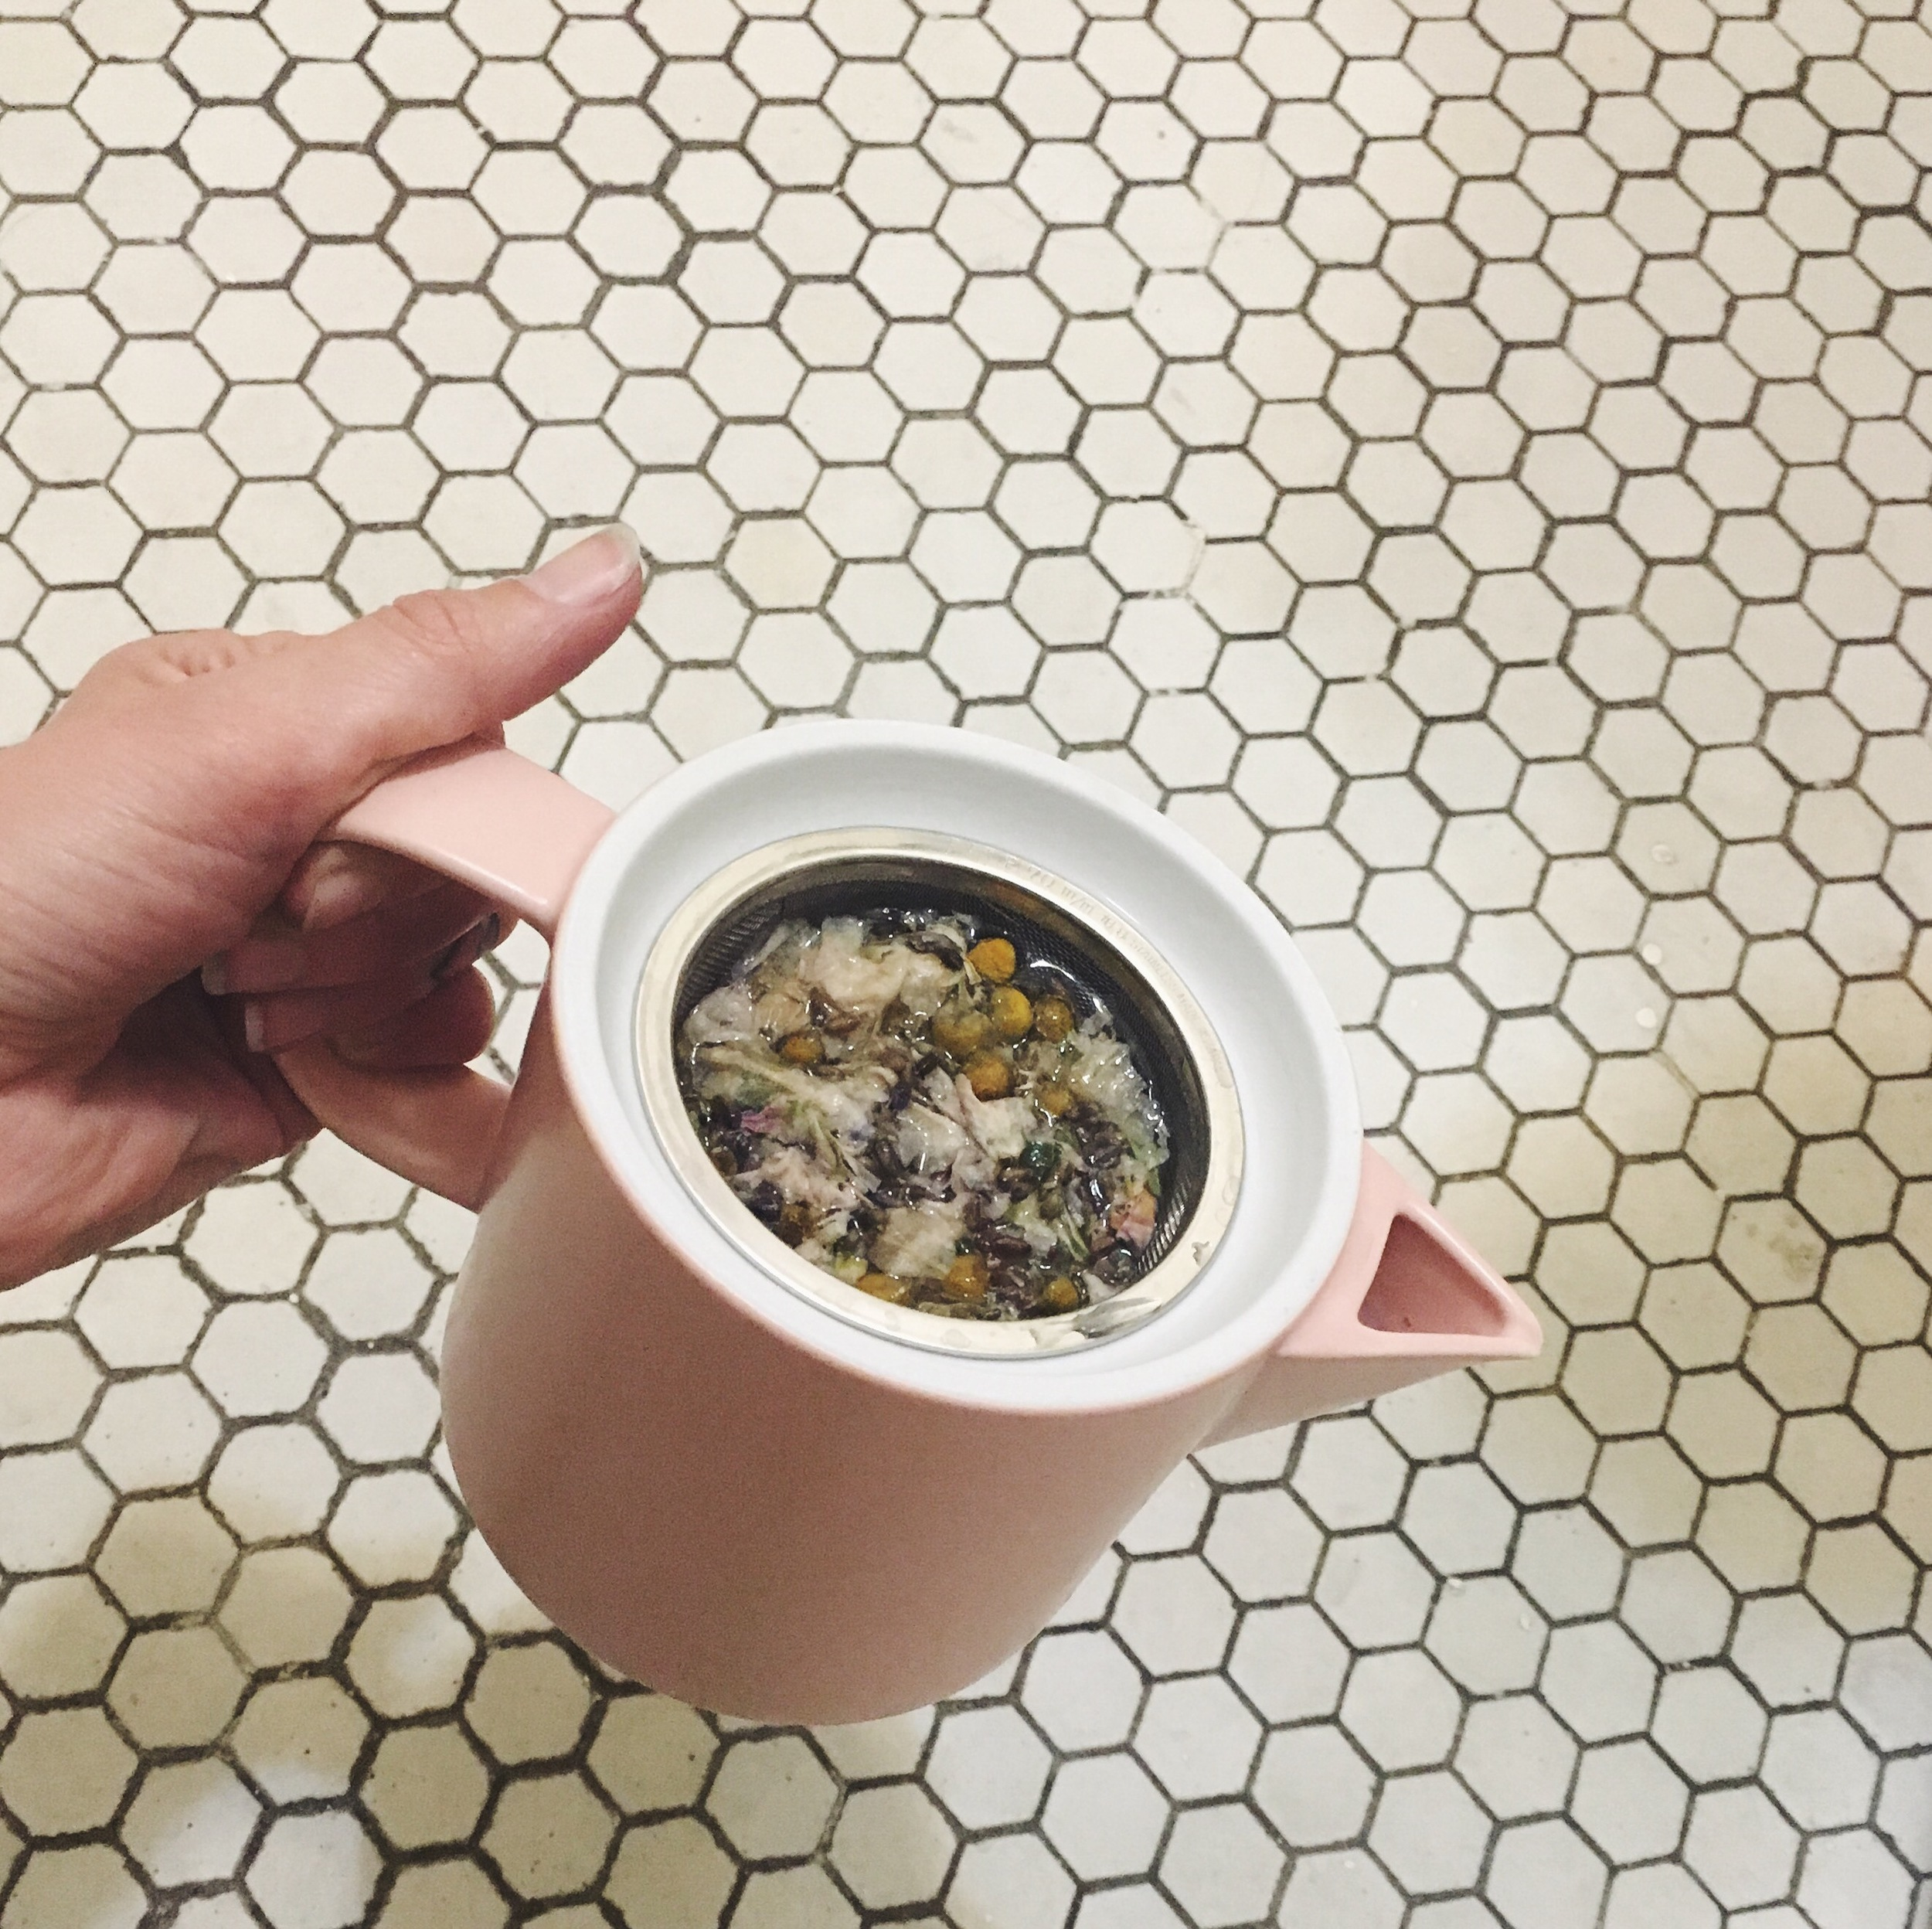 homemade herbal tea blend